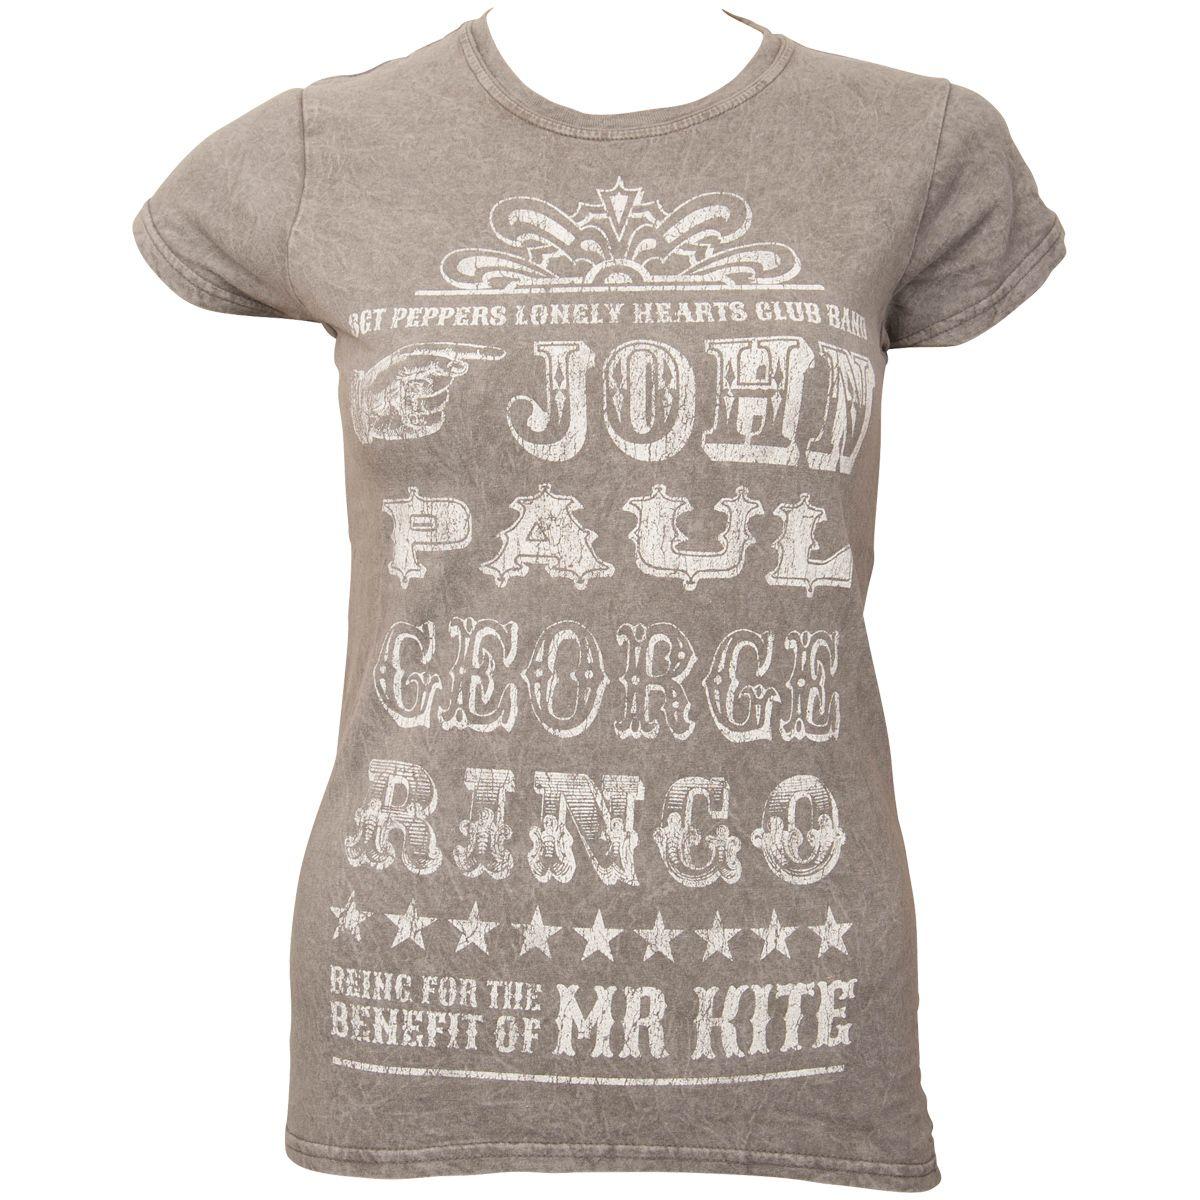 851b03ea4 The Beatles - Women T-Shirt Mr Kite | Rock N Shop | ROCKnSHOP